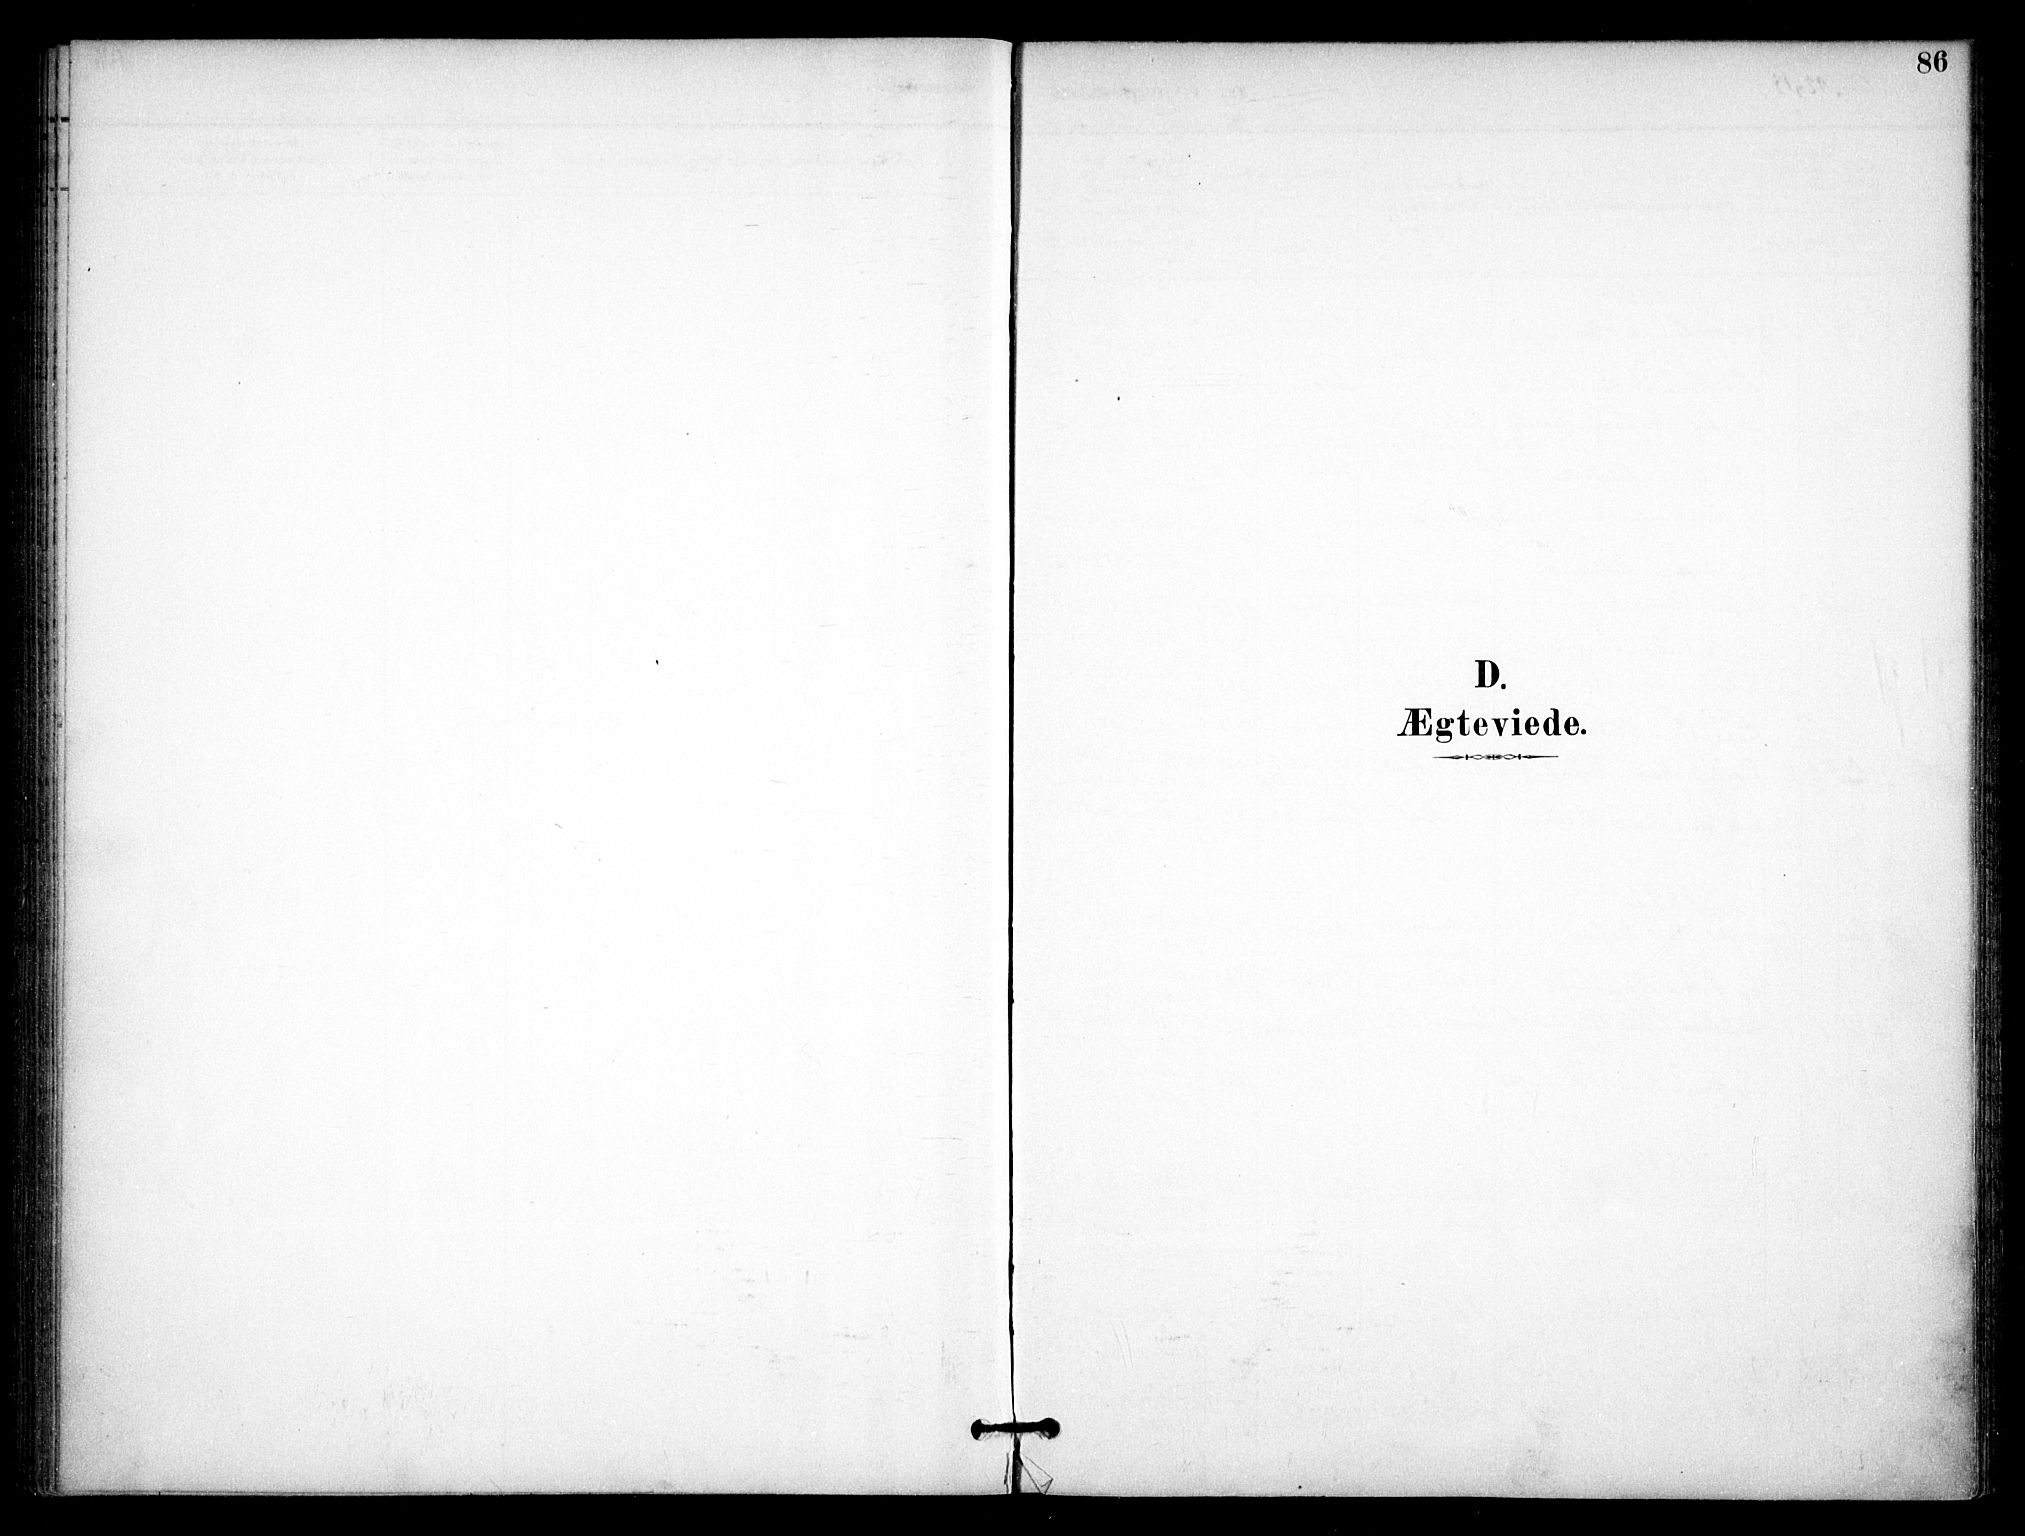 SAO, Nannestad prestekontor Kirkebøker, F/Fb/L0002: Ministerialbok nr. II 2, 1891-1909, s. 86